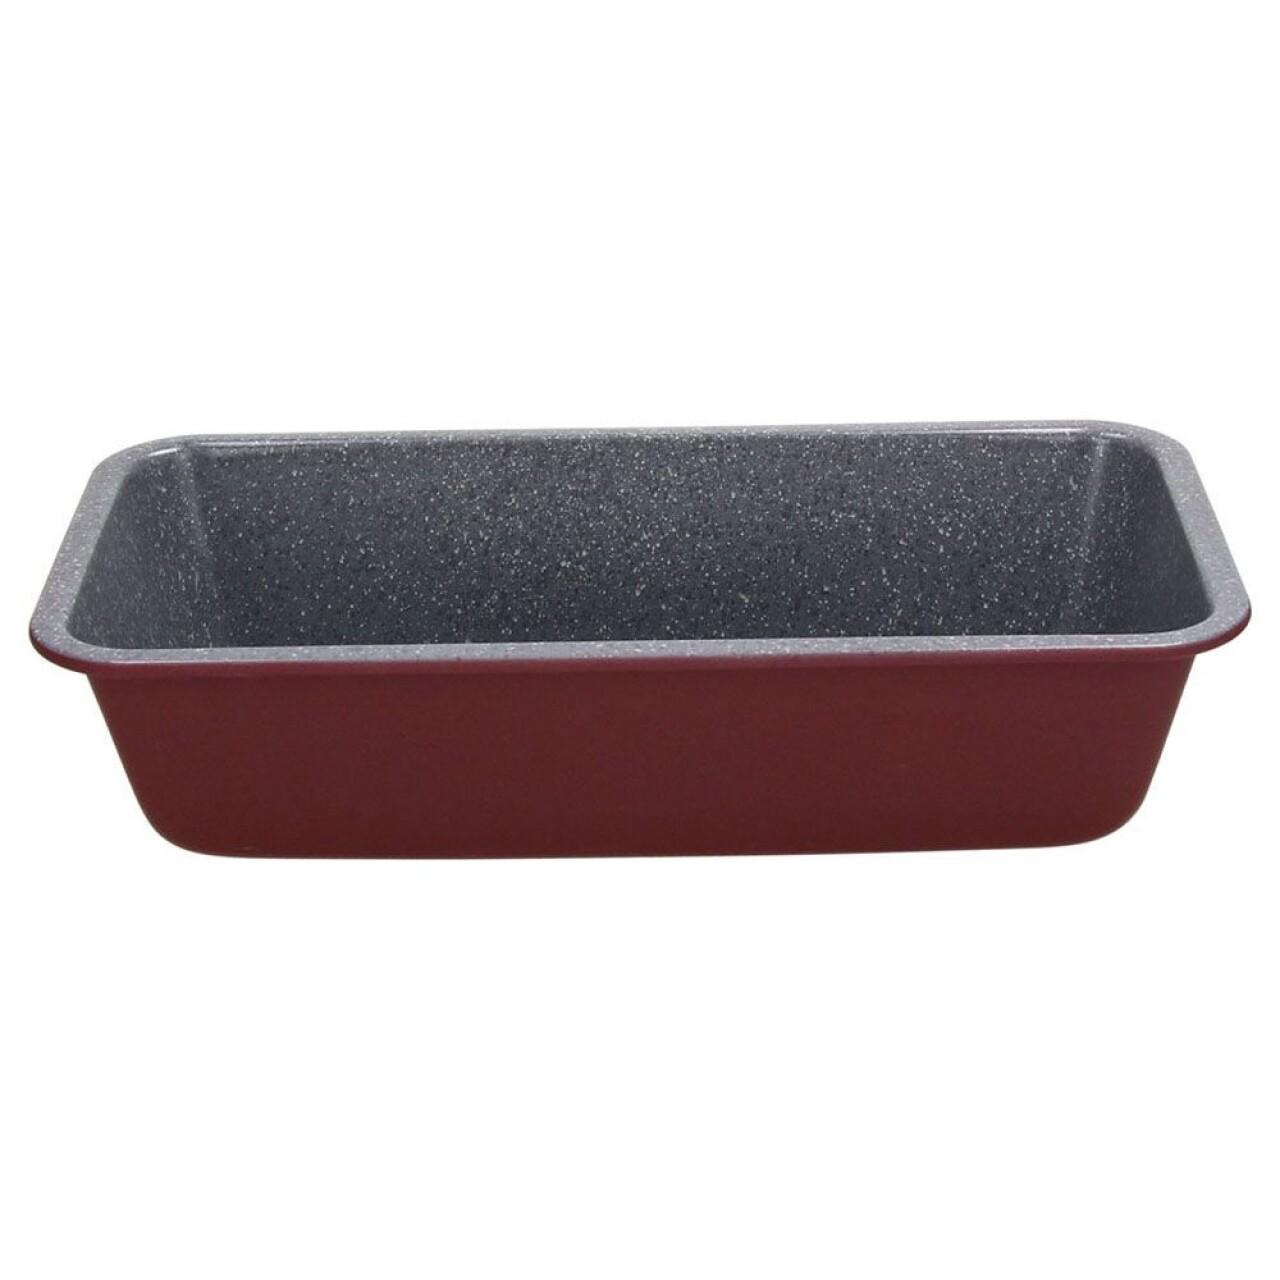 Tava de copt cozonac Sweet Cherry Red, Tognana, 13.5 x 28.5 x 7 cm, otel carbon, burgund/gri